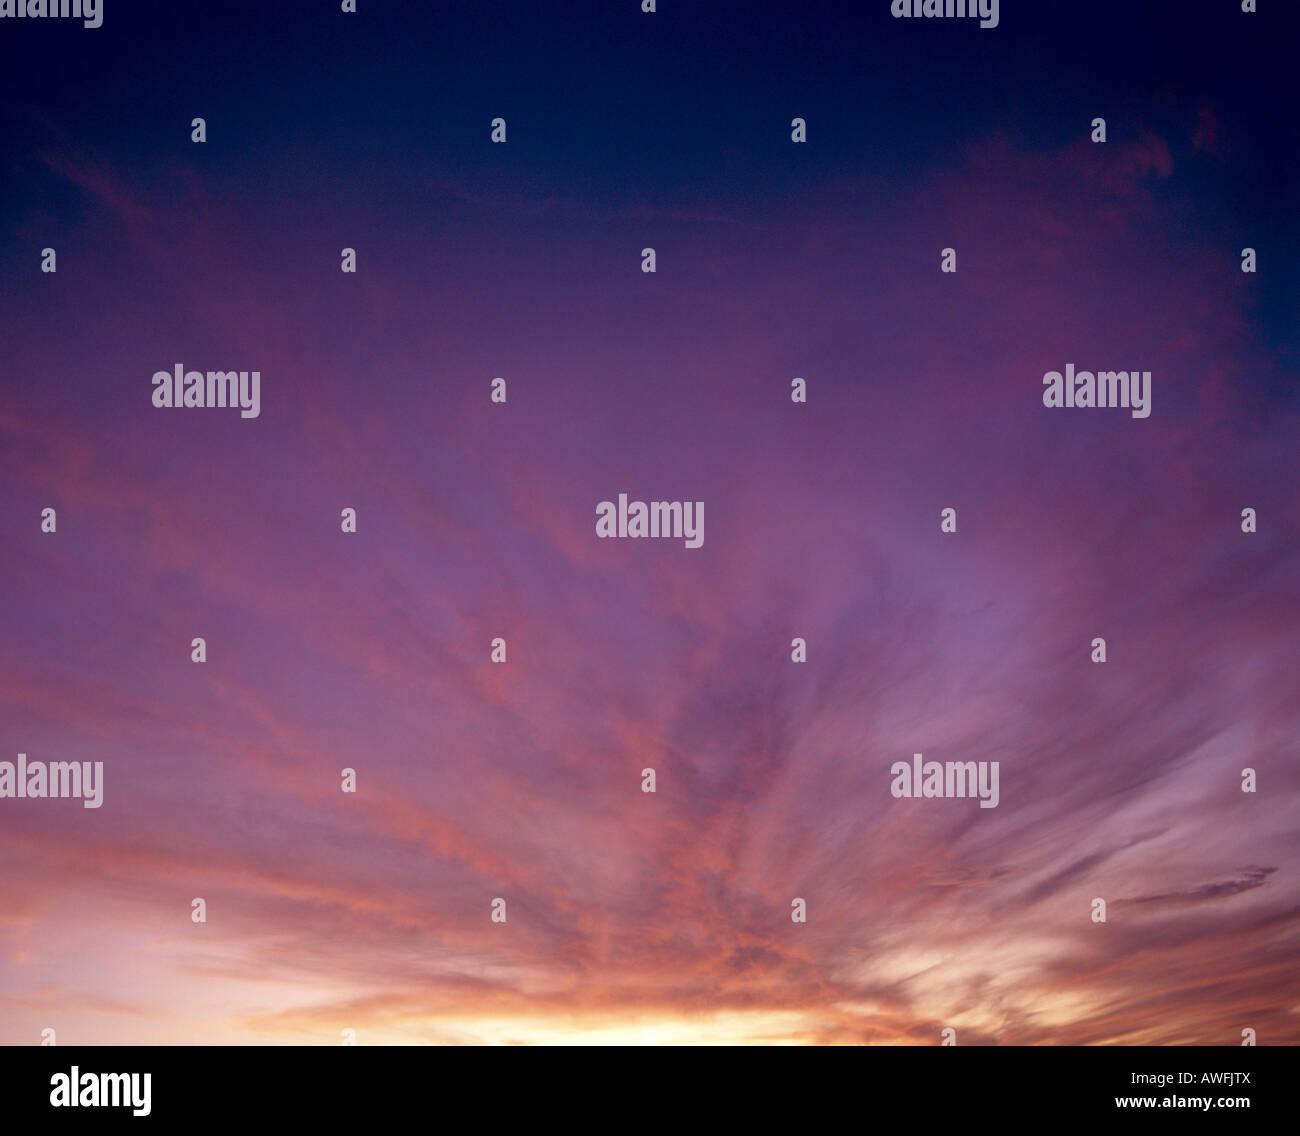 Glowing night sky - Stock Image